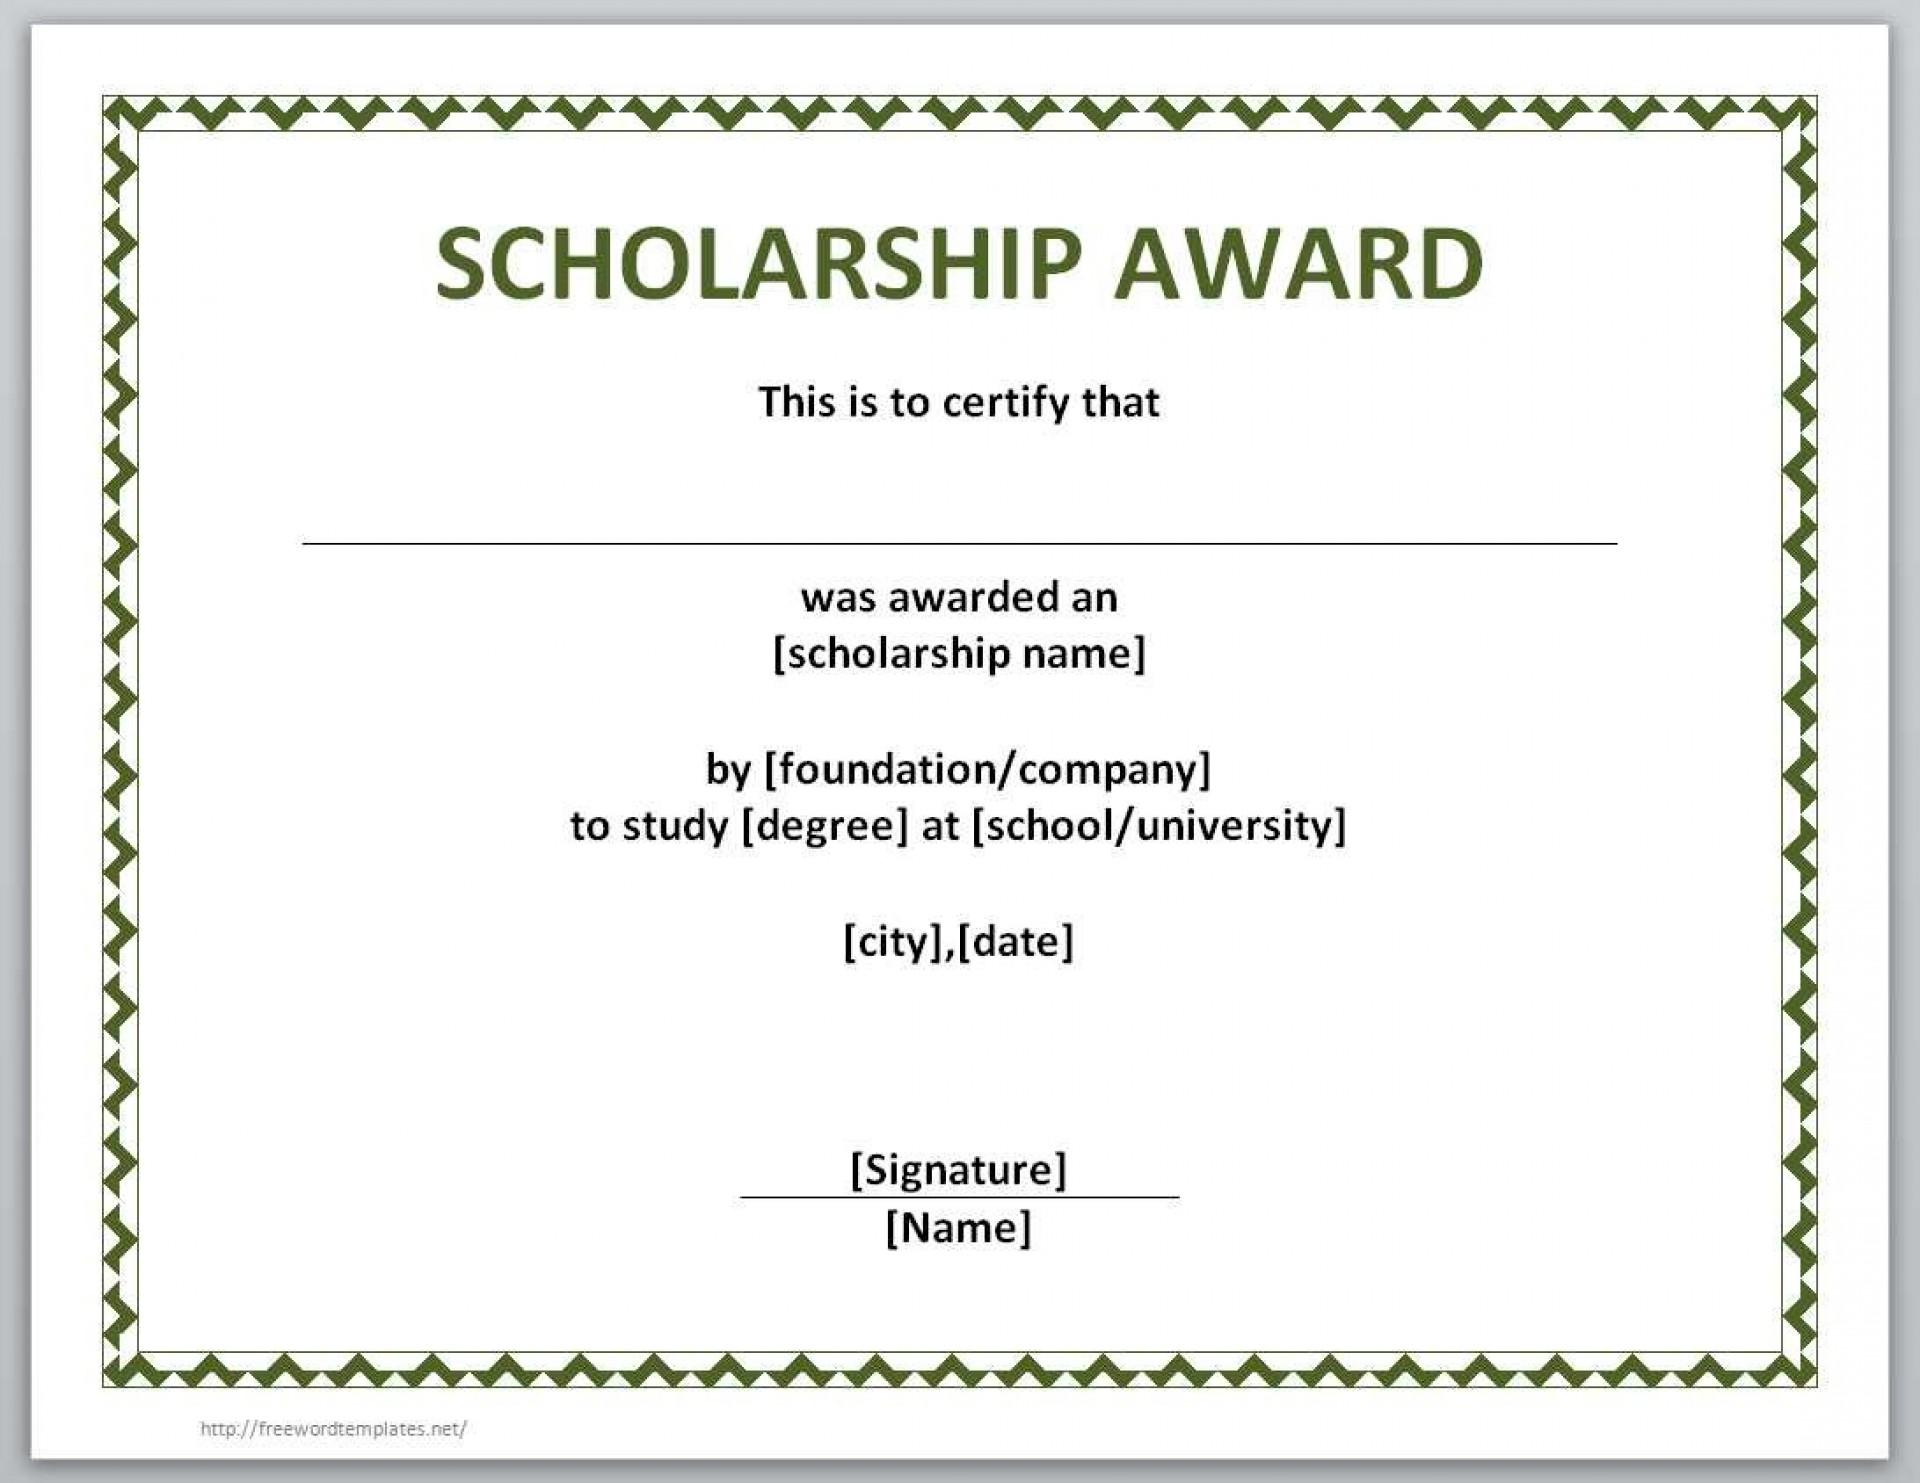 008 Beautiful Microsoft Word Certificate Template Highest Clarity  2003 Award M Appreciation Of Authenticity1920